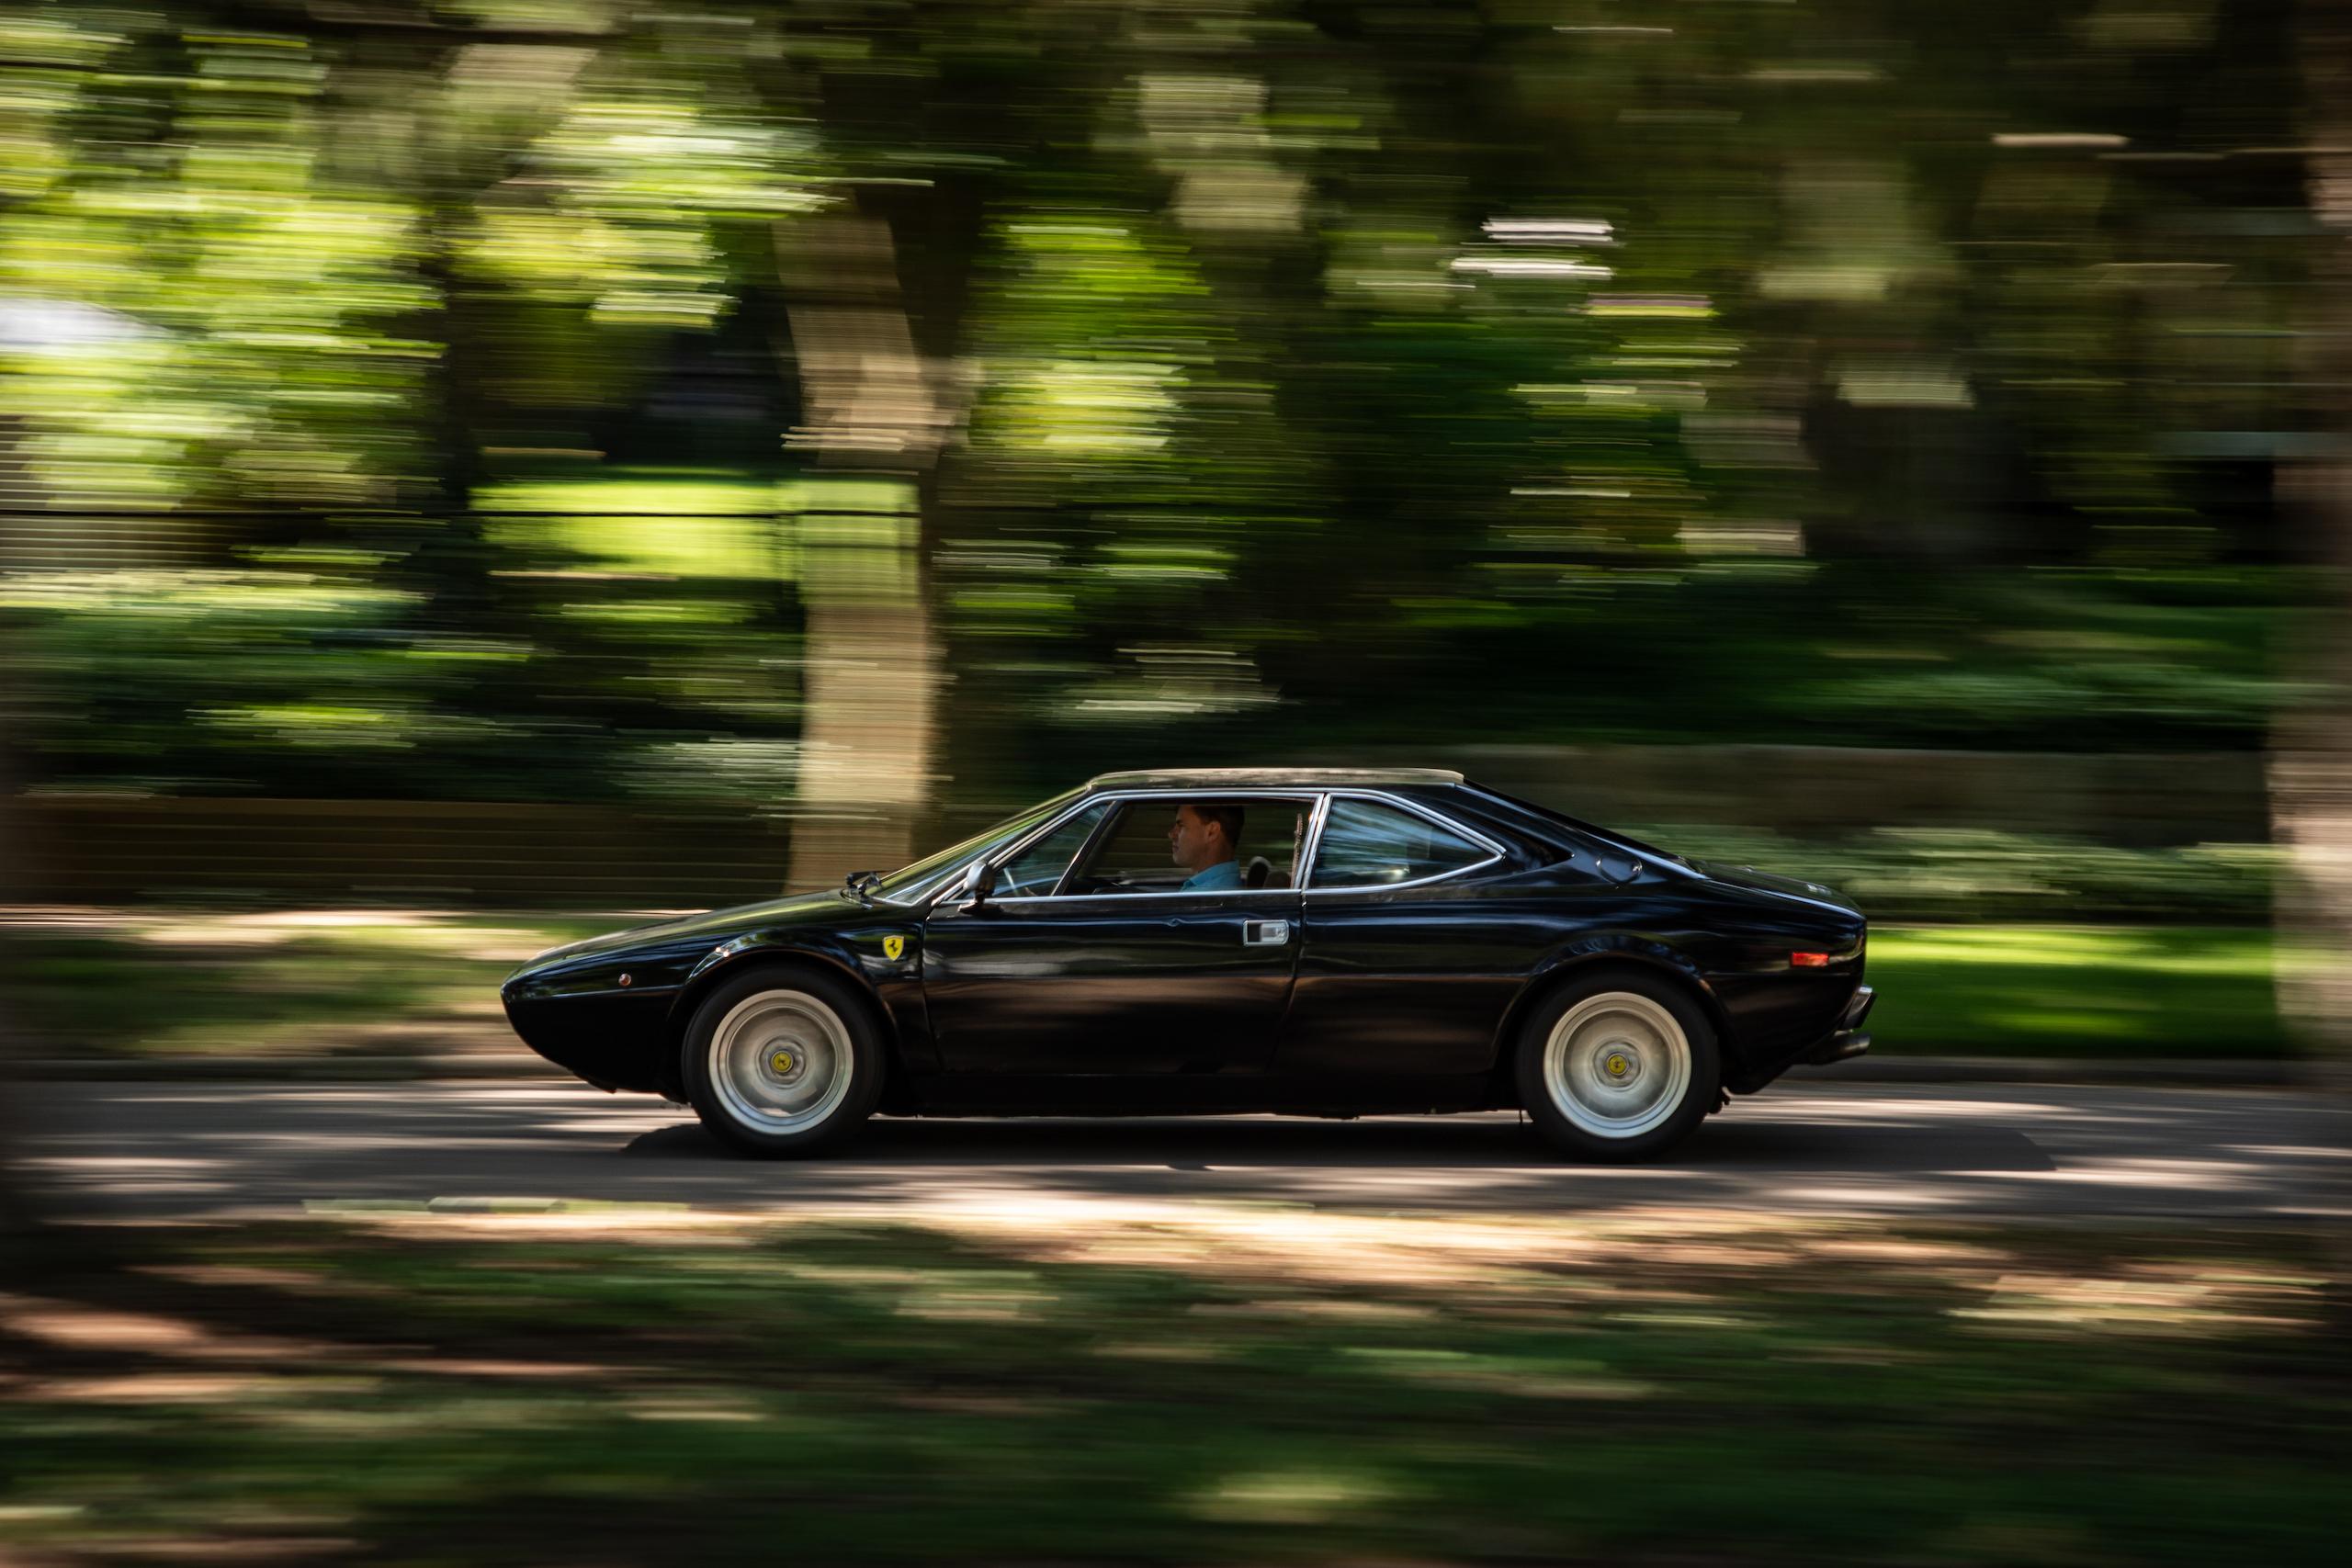 Ferrari Dino restoration side profile driving action